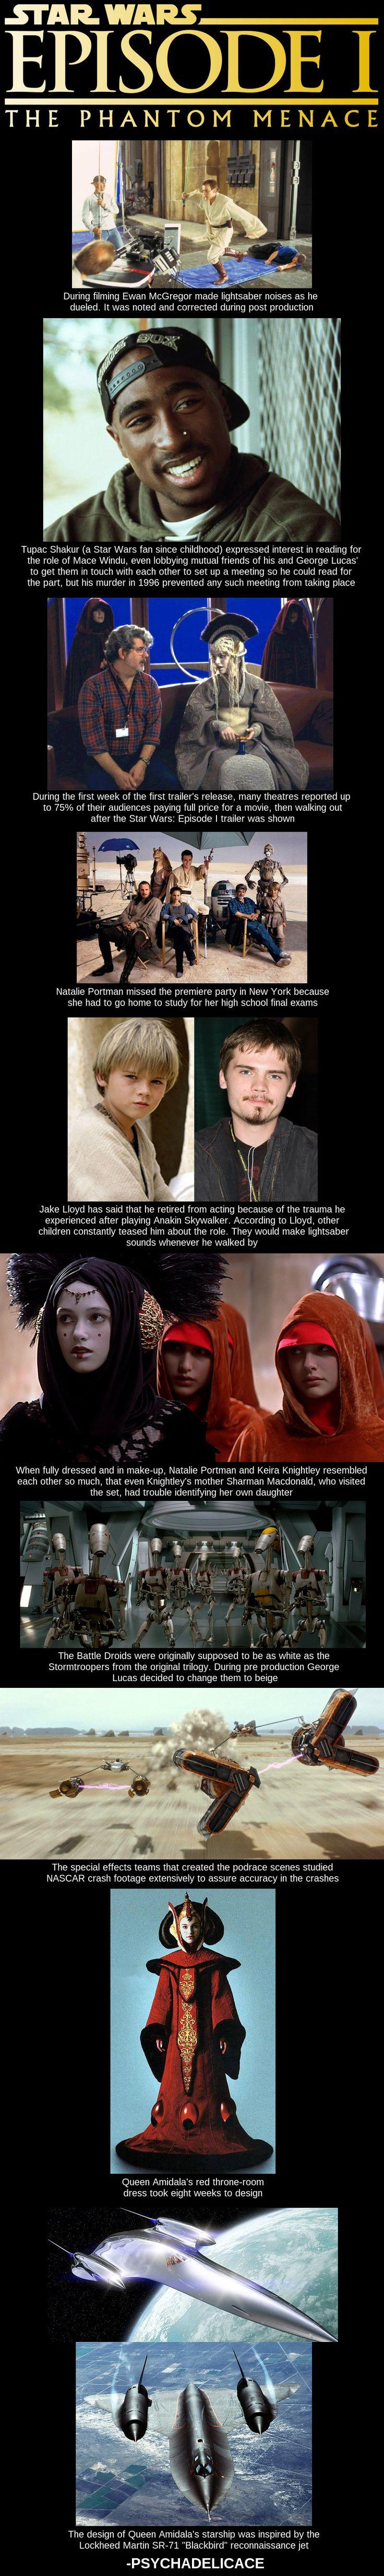 Phantom Menace facts